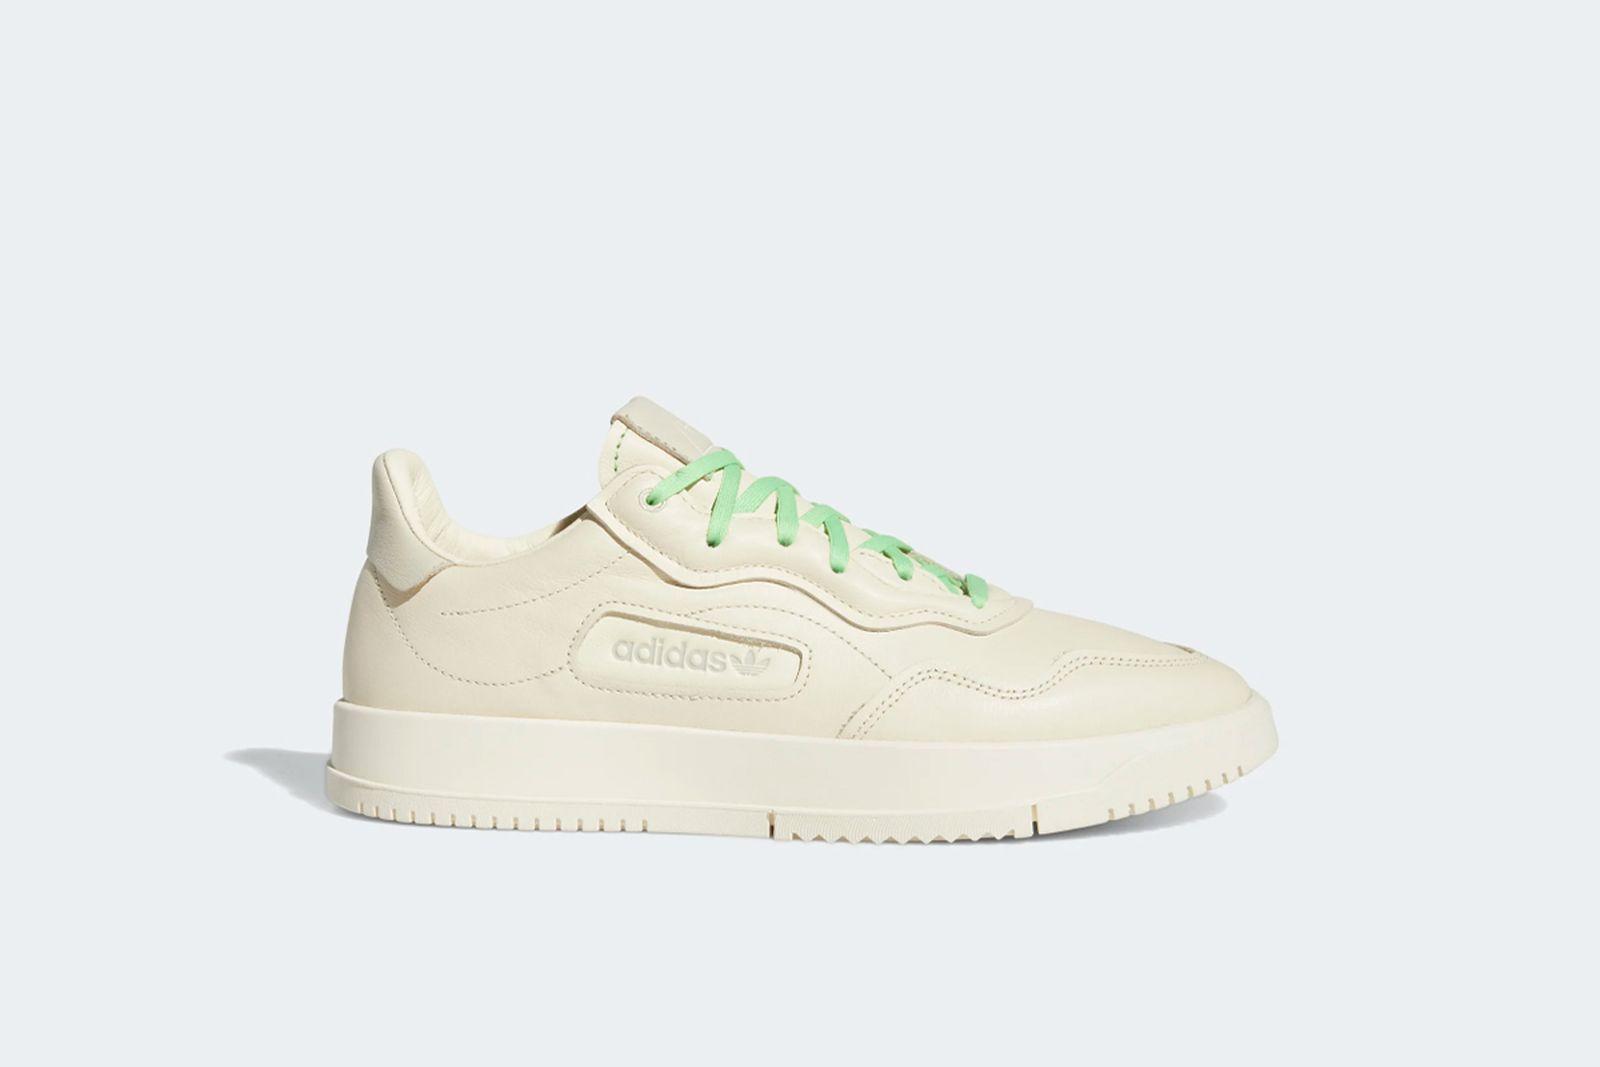 Pharrell Williams x Adidas 2020 SC Premier Sneaker